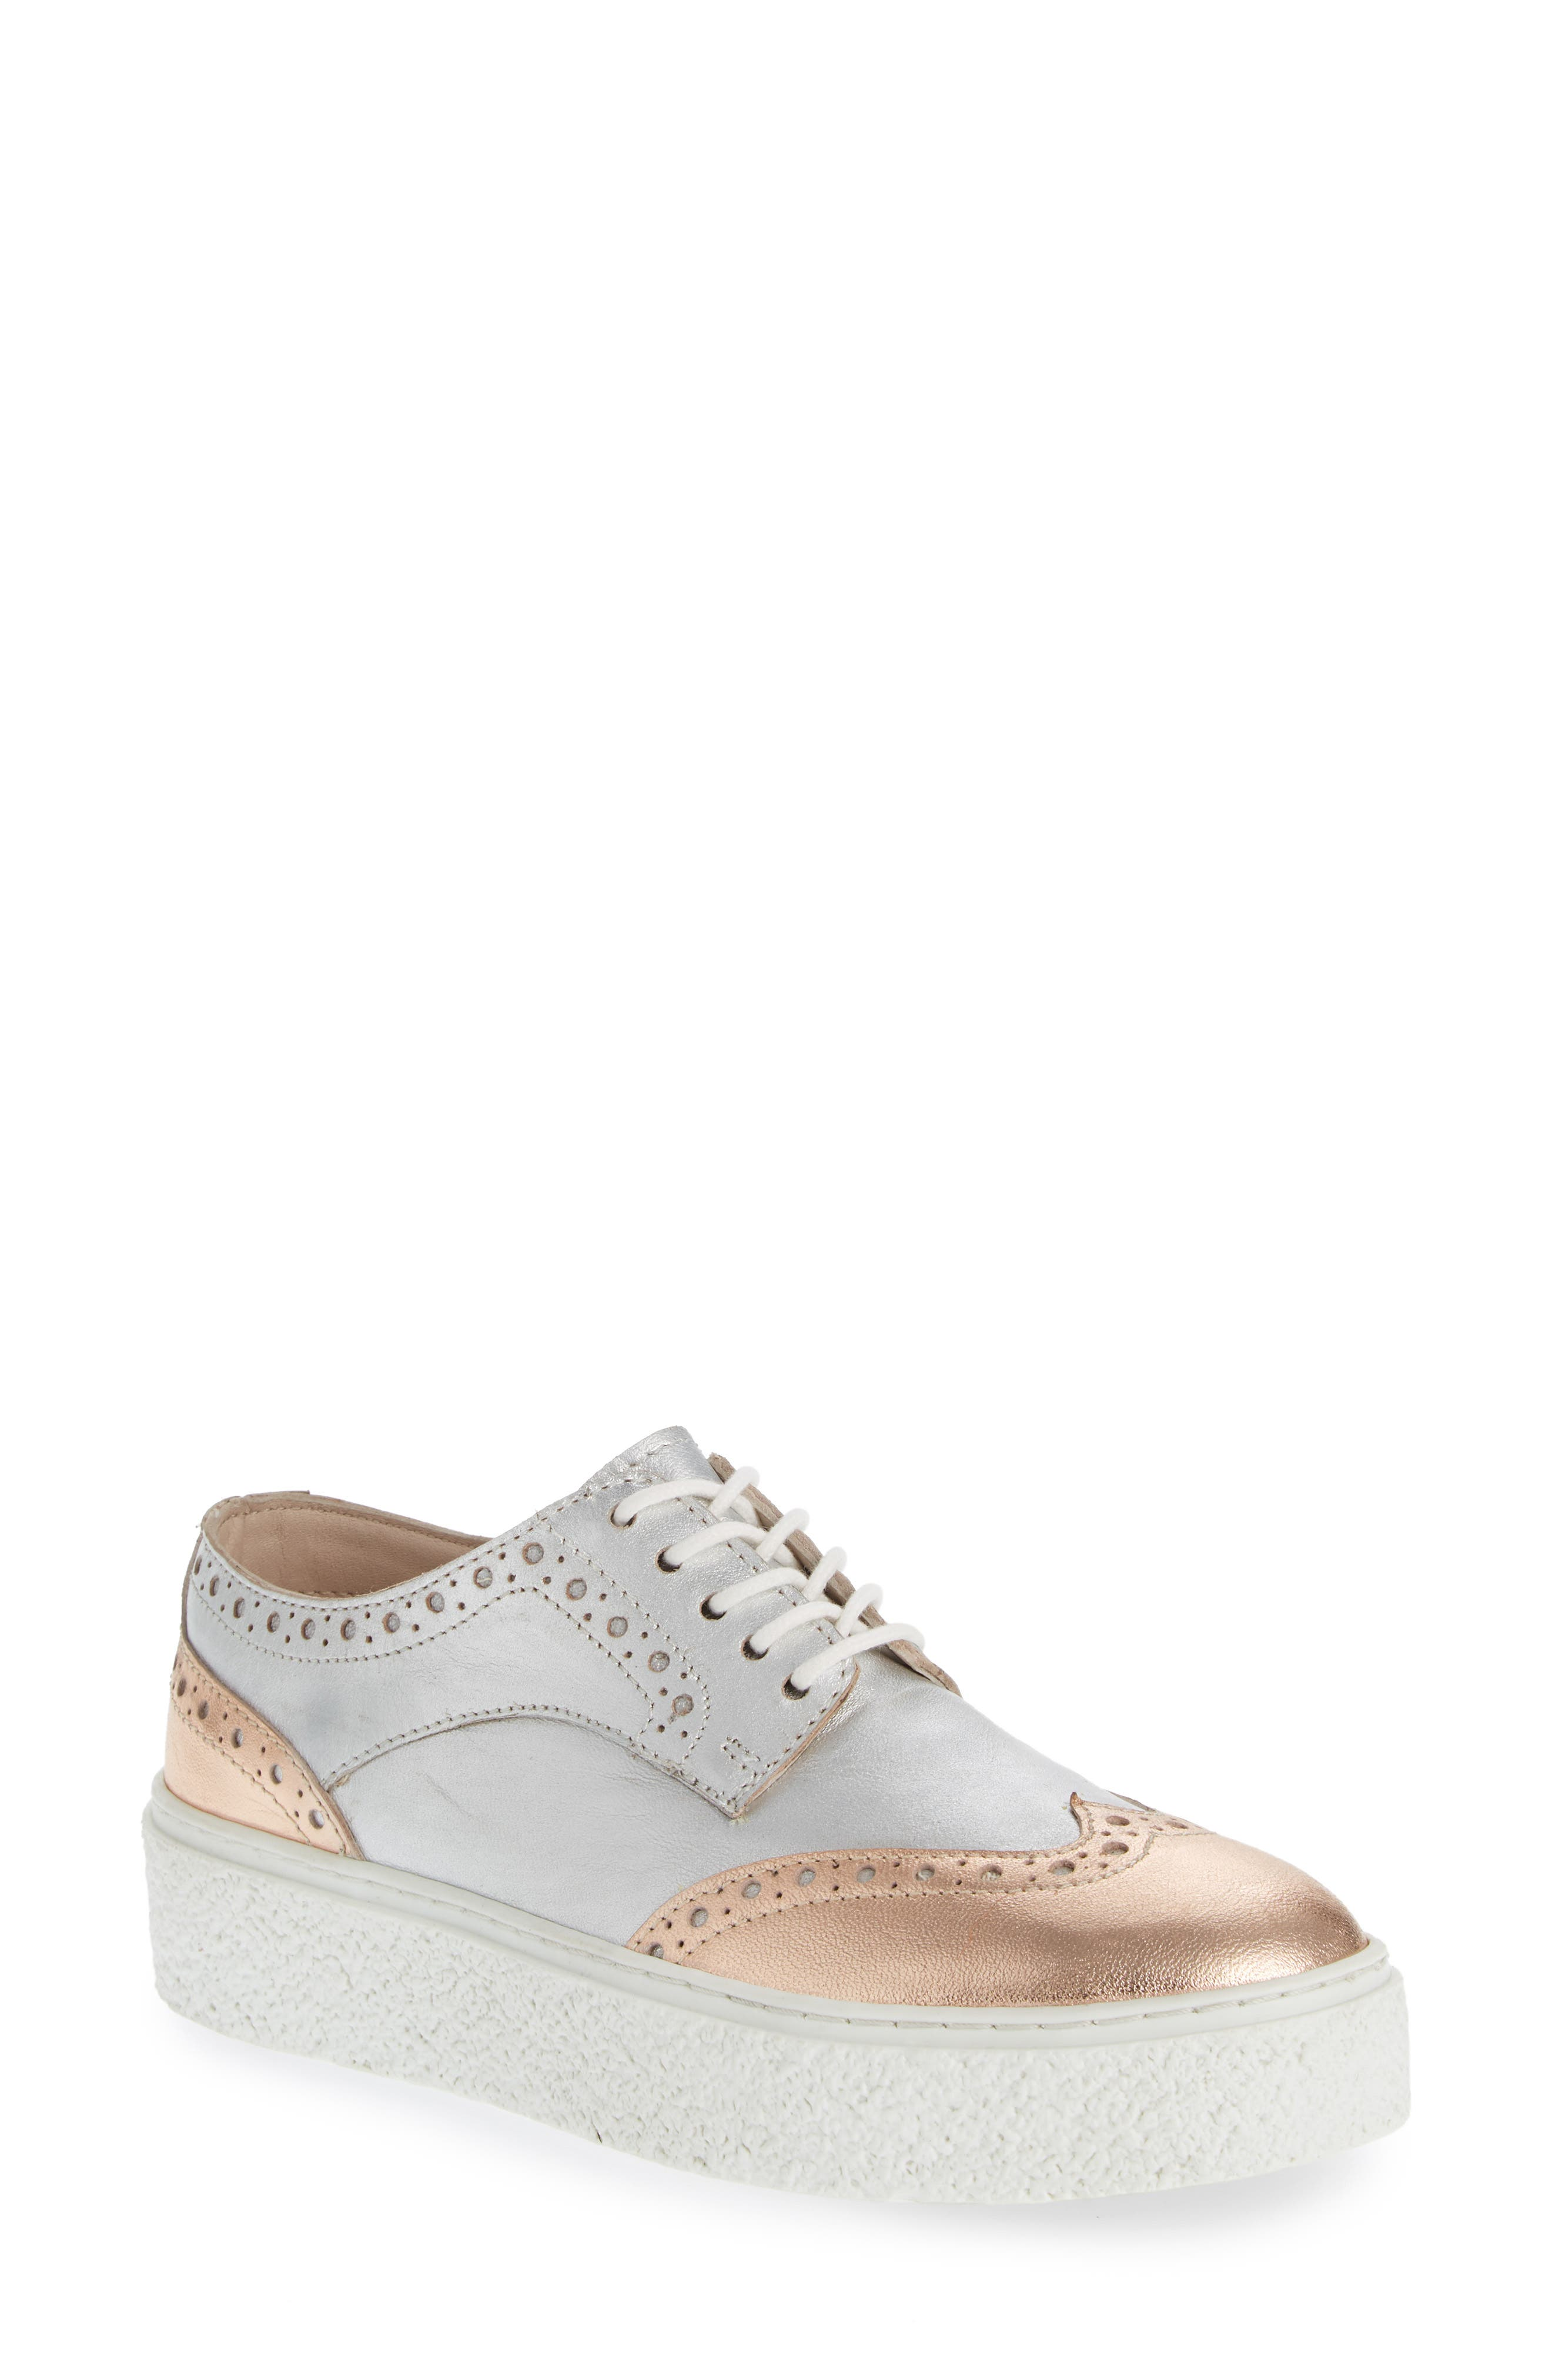 Seychelles Ideal Platform Sneaker, Metallic